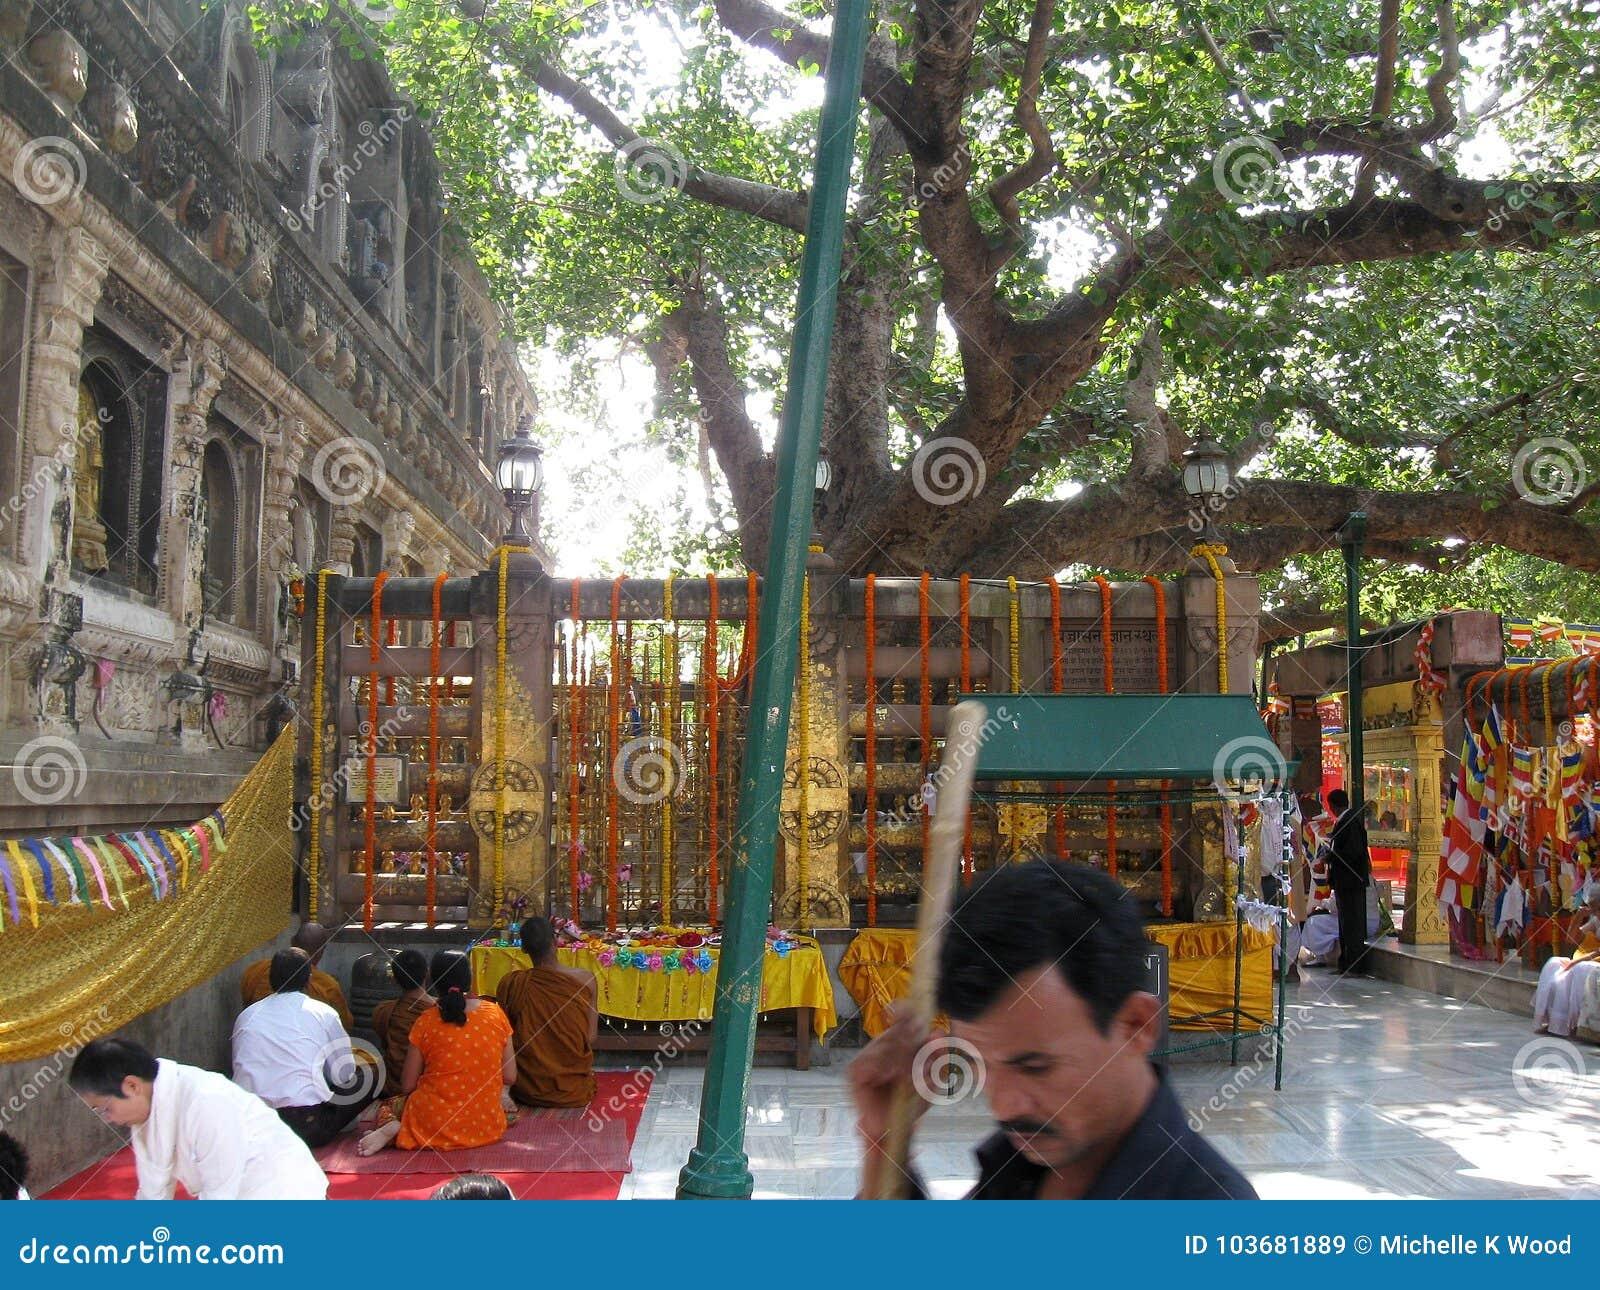 People Meditating beneath Bodhi Tree - Great Buddha Mahabodhi Mahavihara Temple BodhGaya India